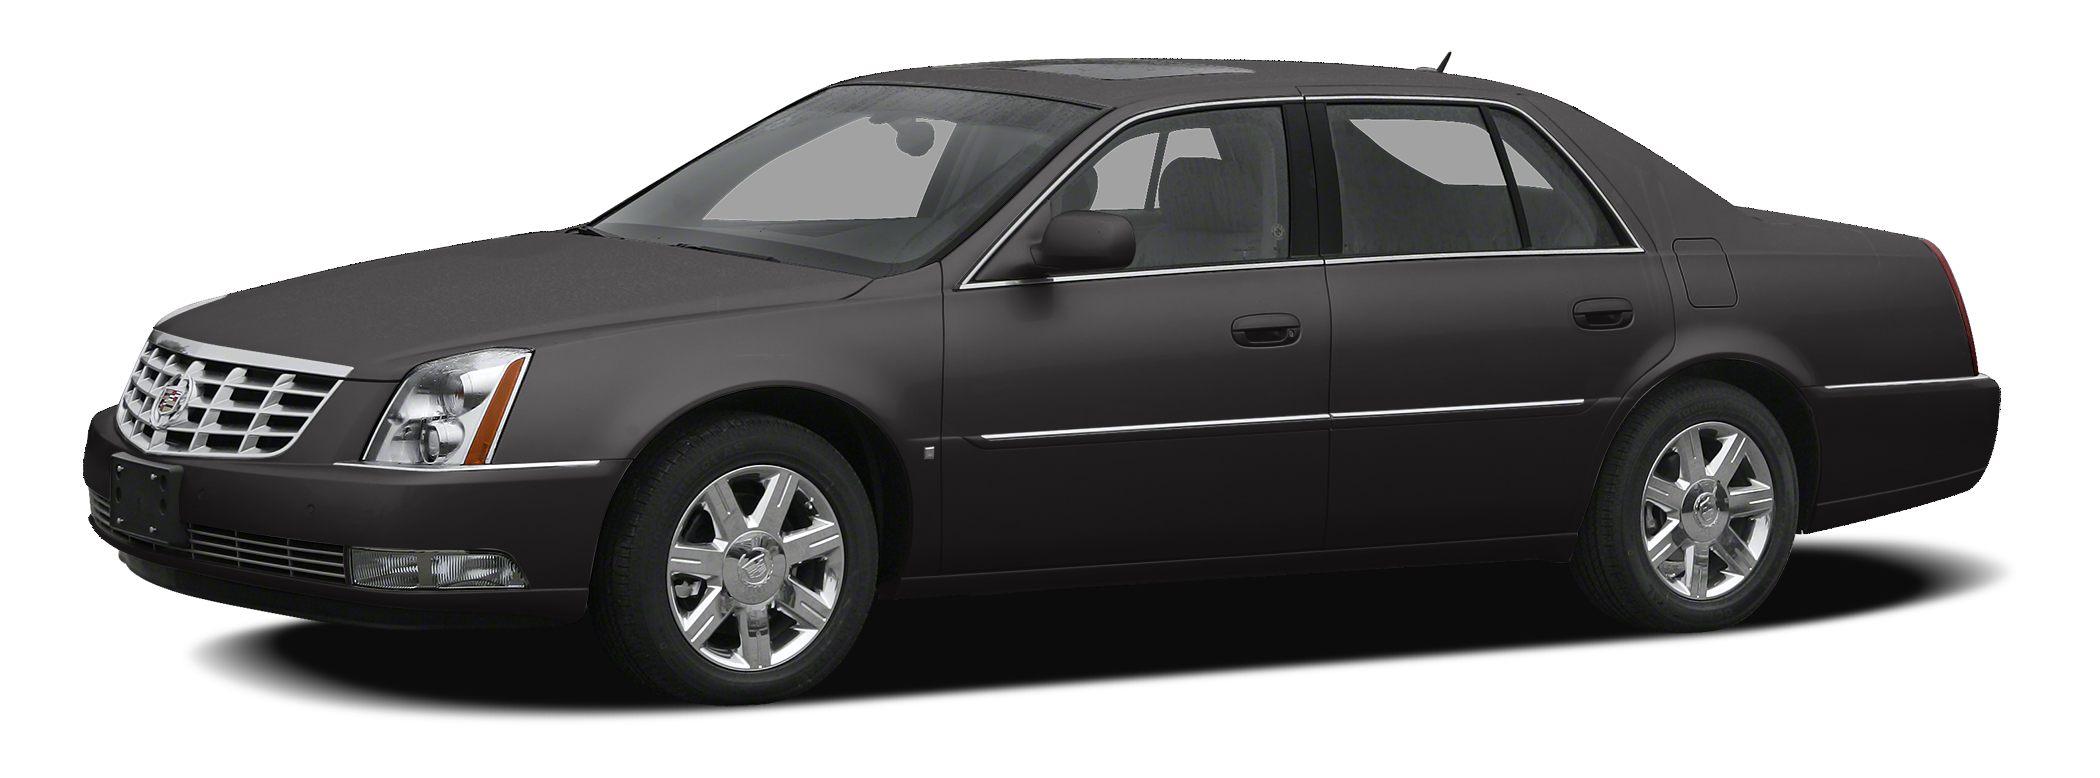 2011 Cadillac DTS Platinum Collection Miles 72401Color Black Stock 3619X VIN 1G6KP5ES0BU1010